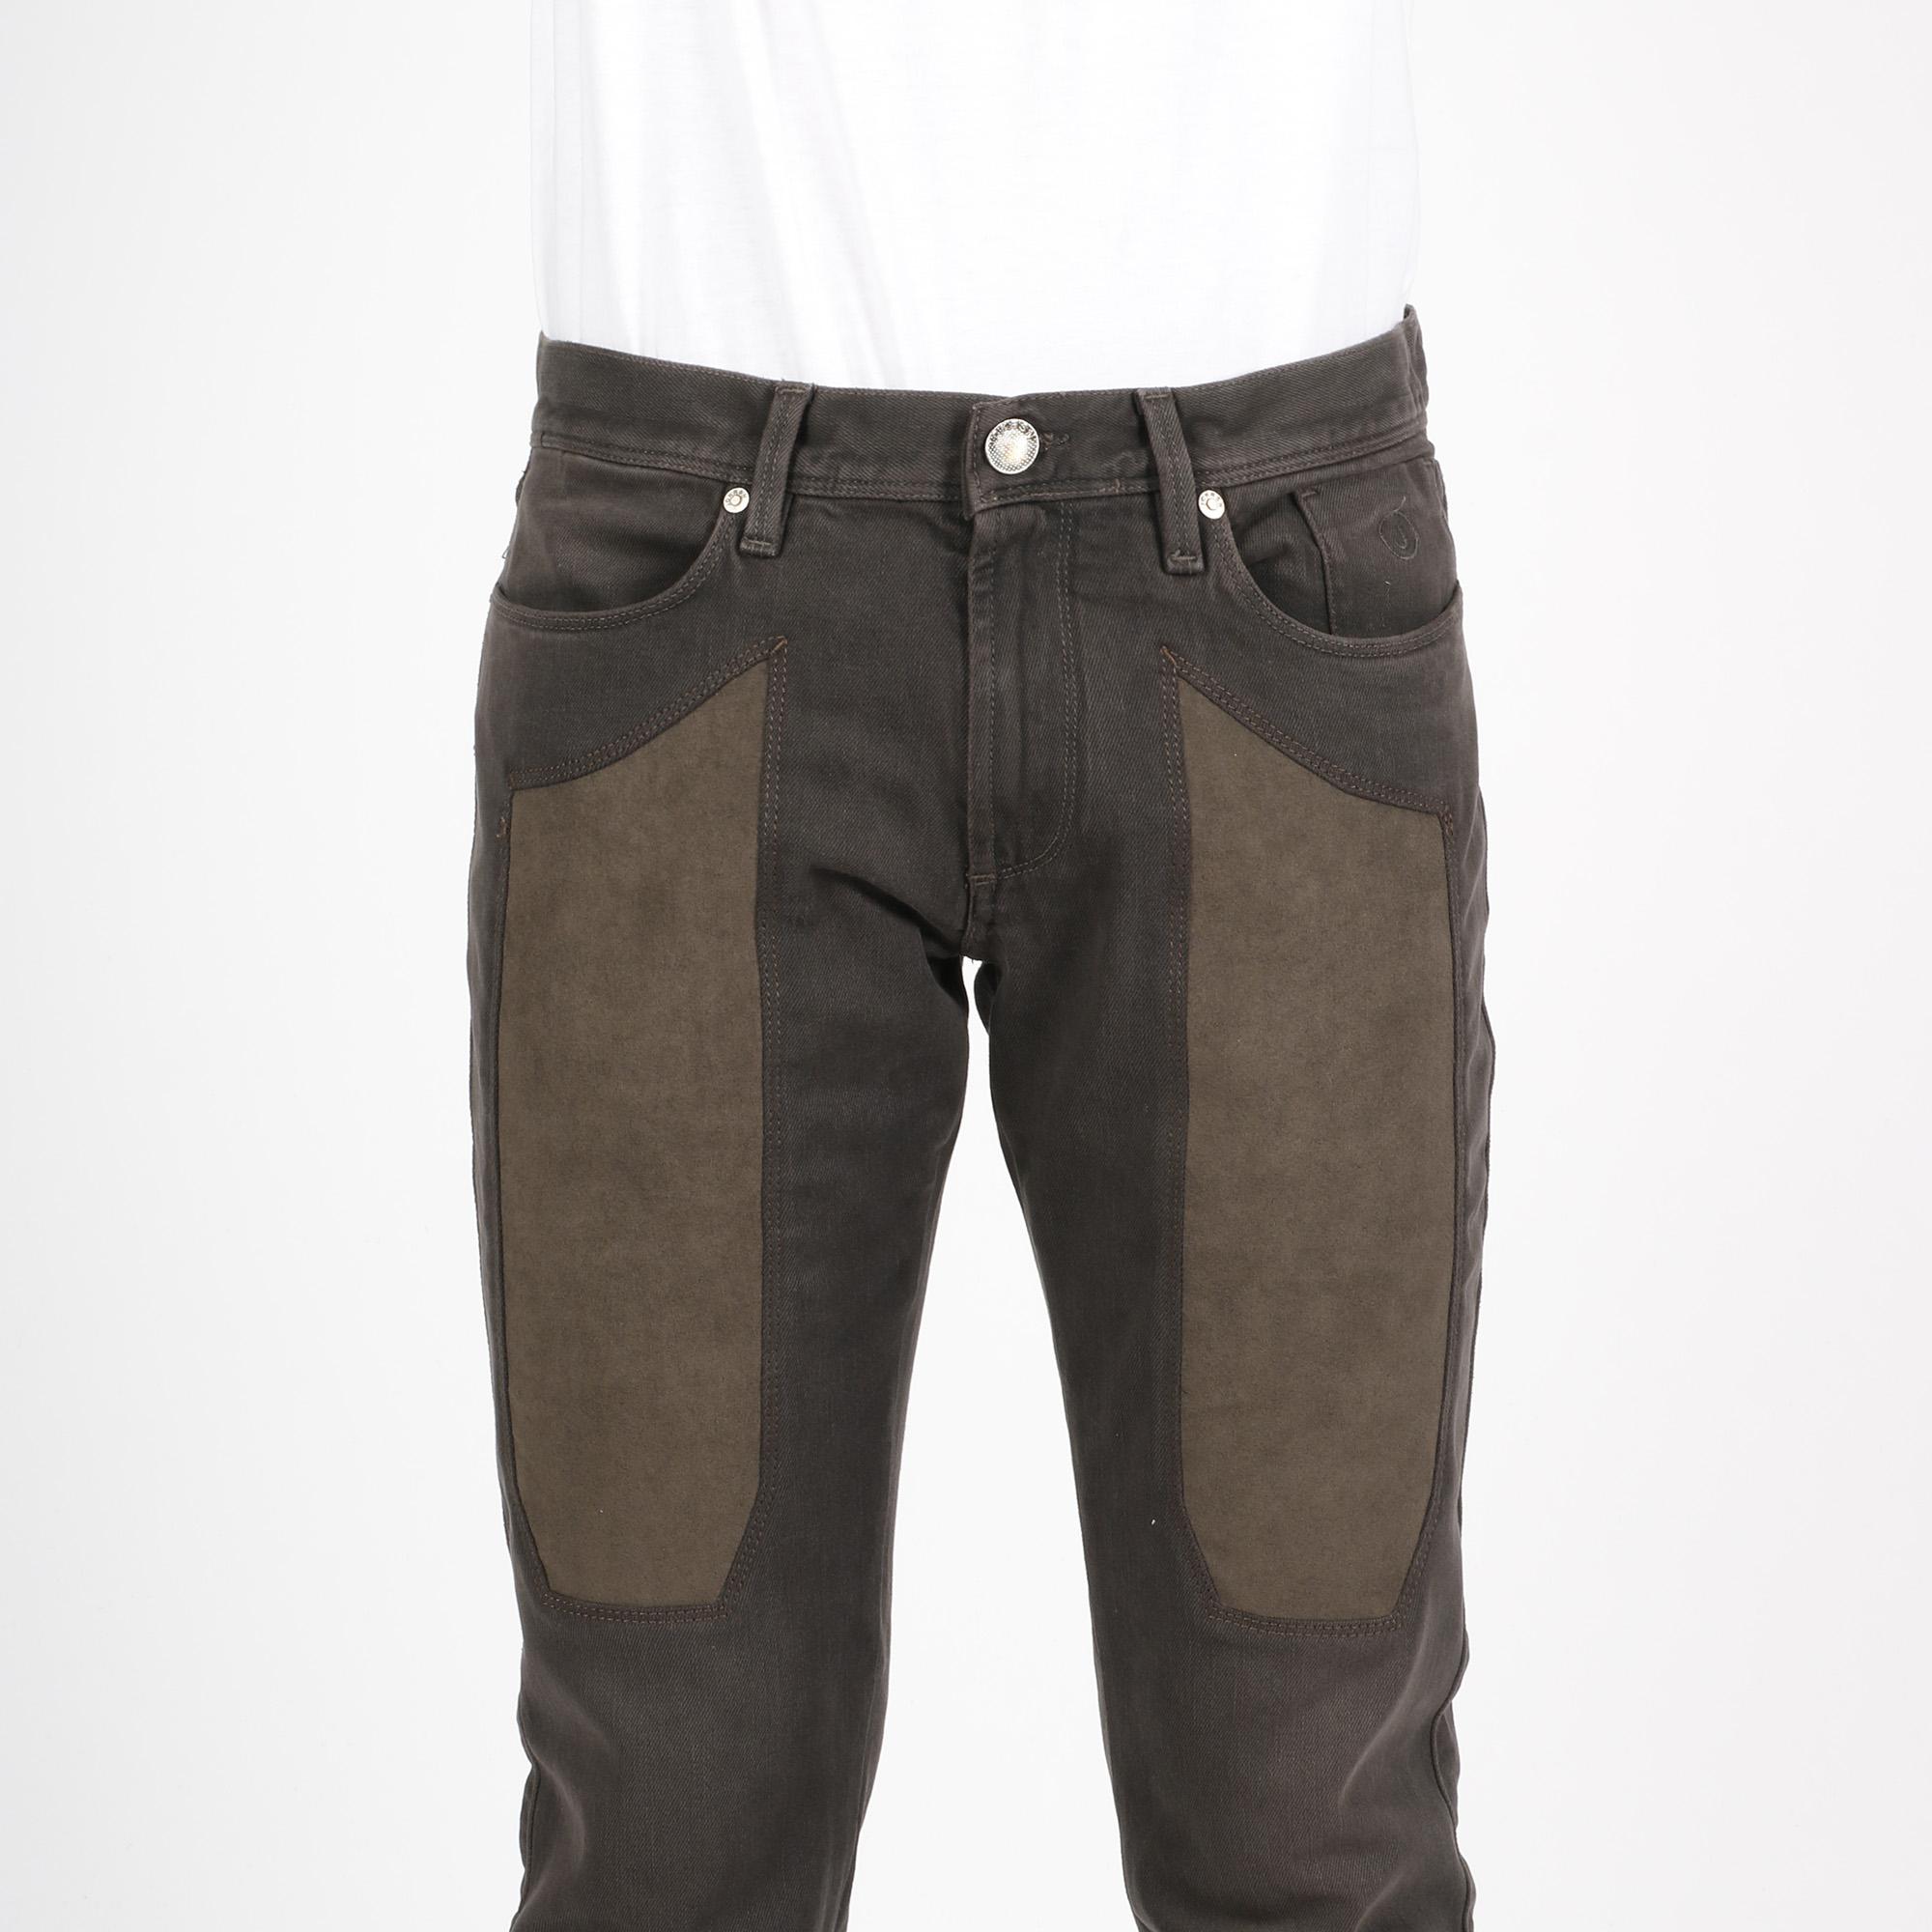 Jeans toppa moro - Moro